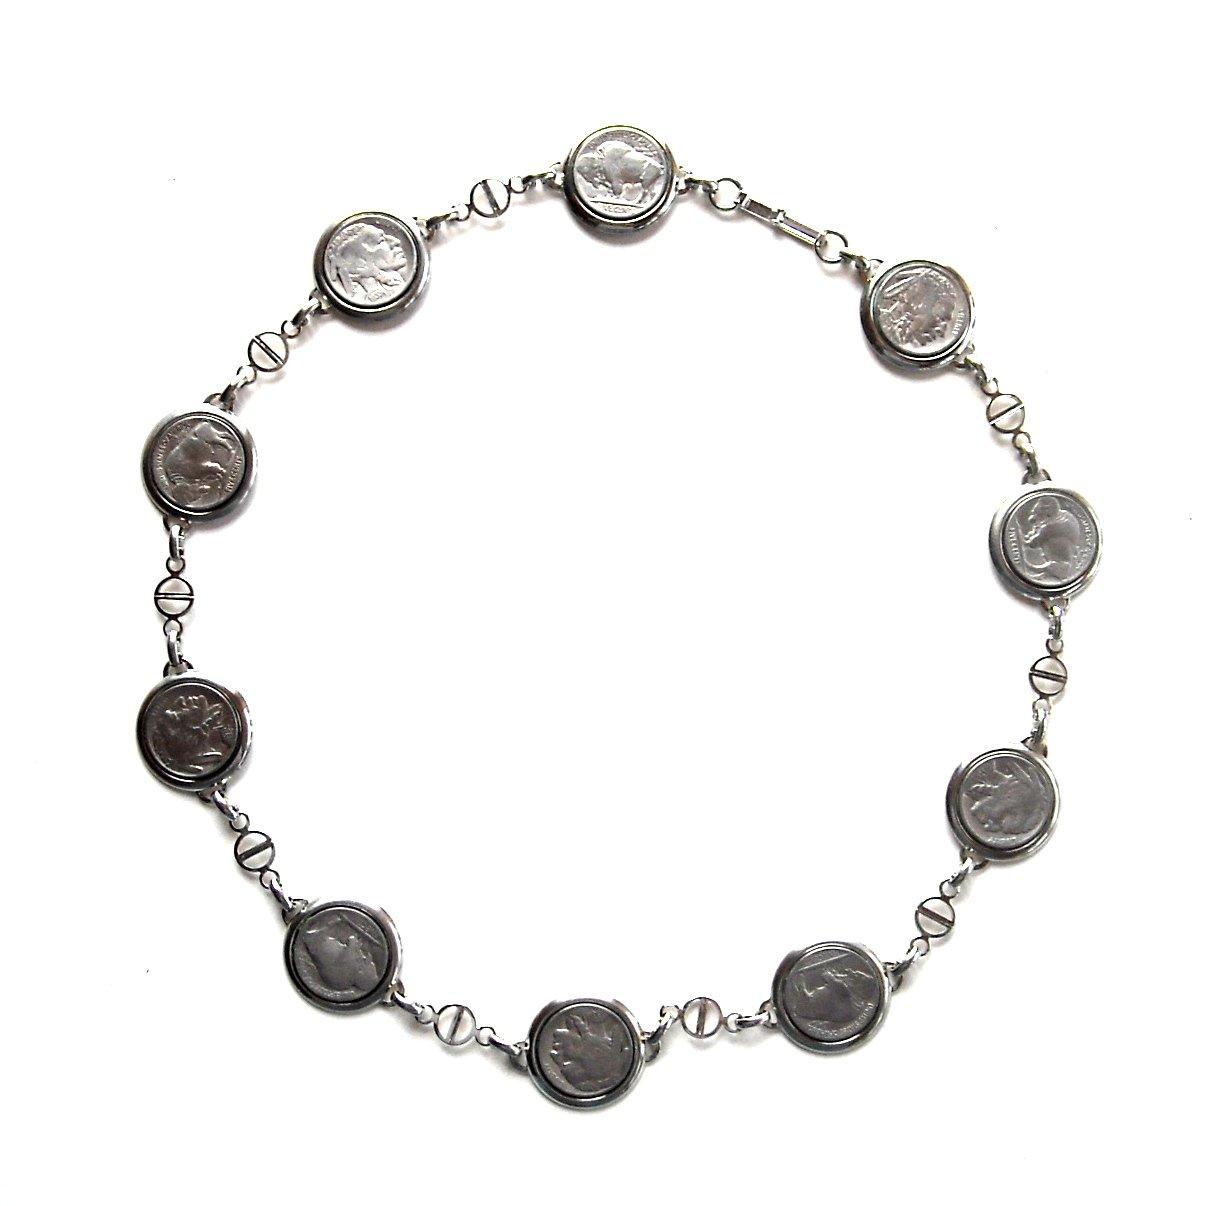 Genuine Indian Head Buffalo Nickel Coins Necklace